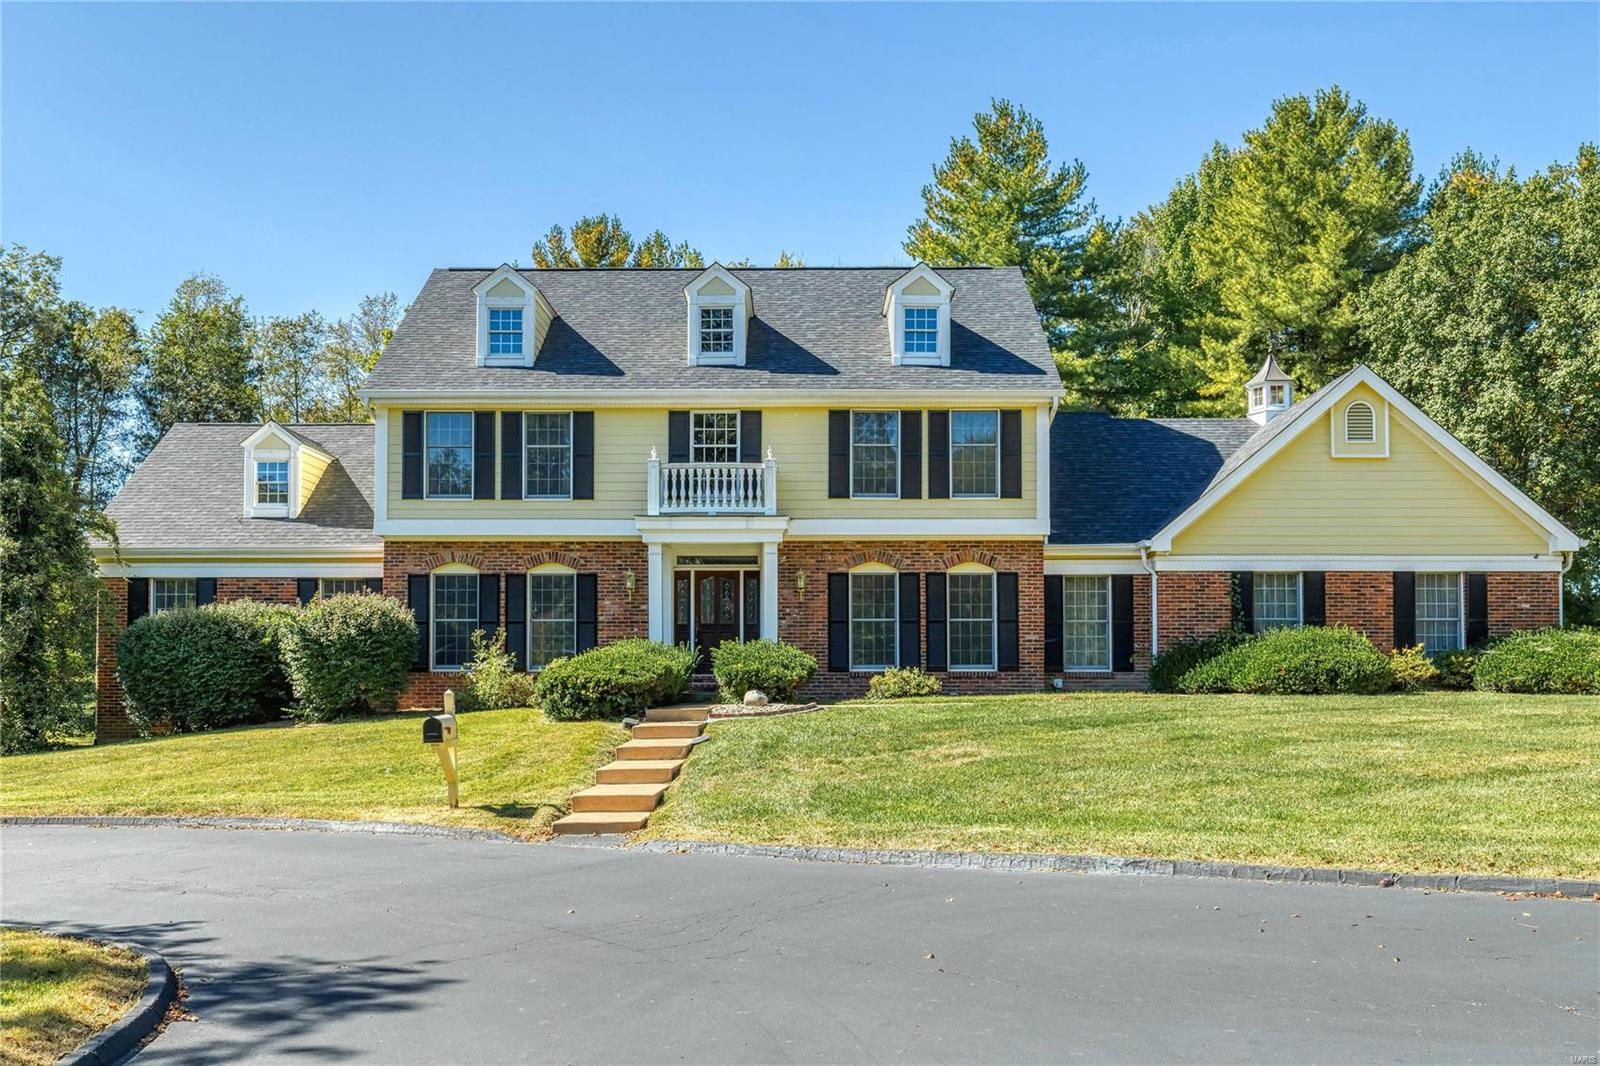 178 S Mason Road Property Photo - Creve Coeur, MO real estate listing